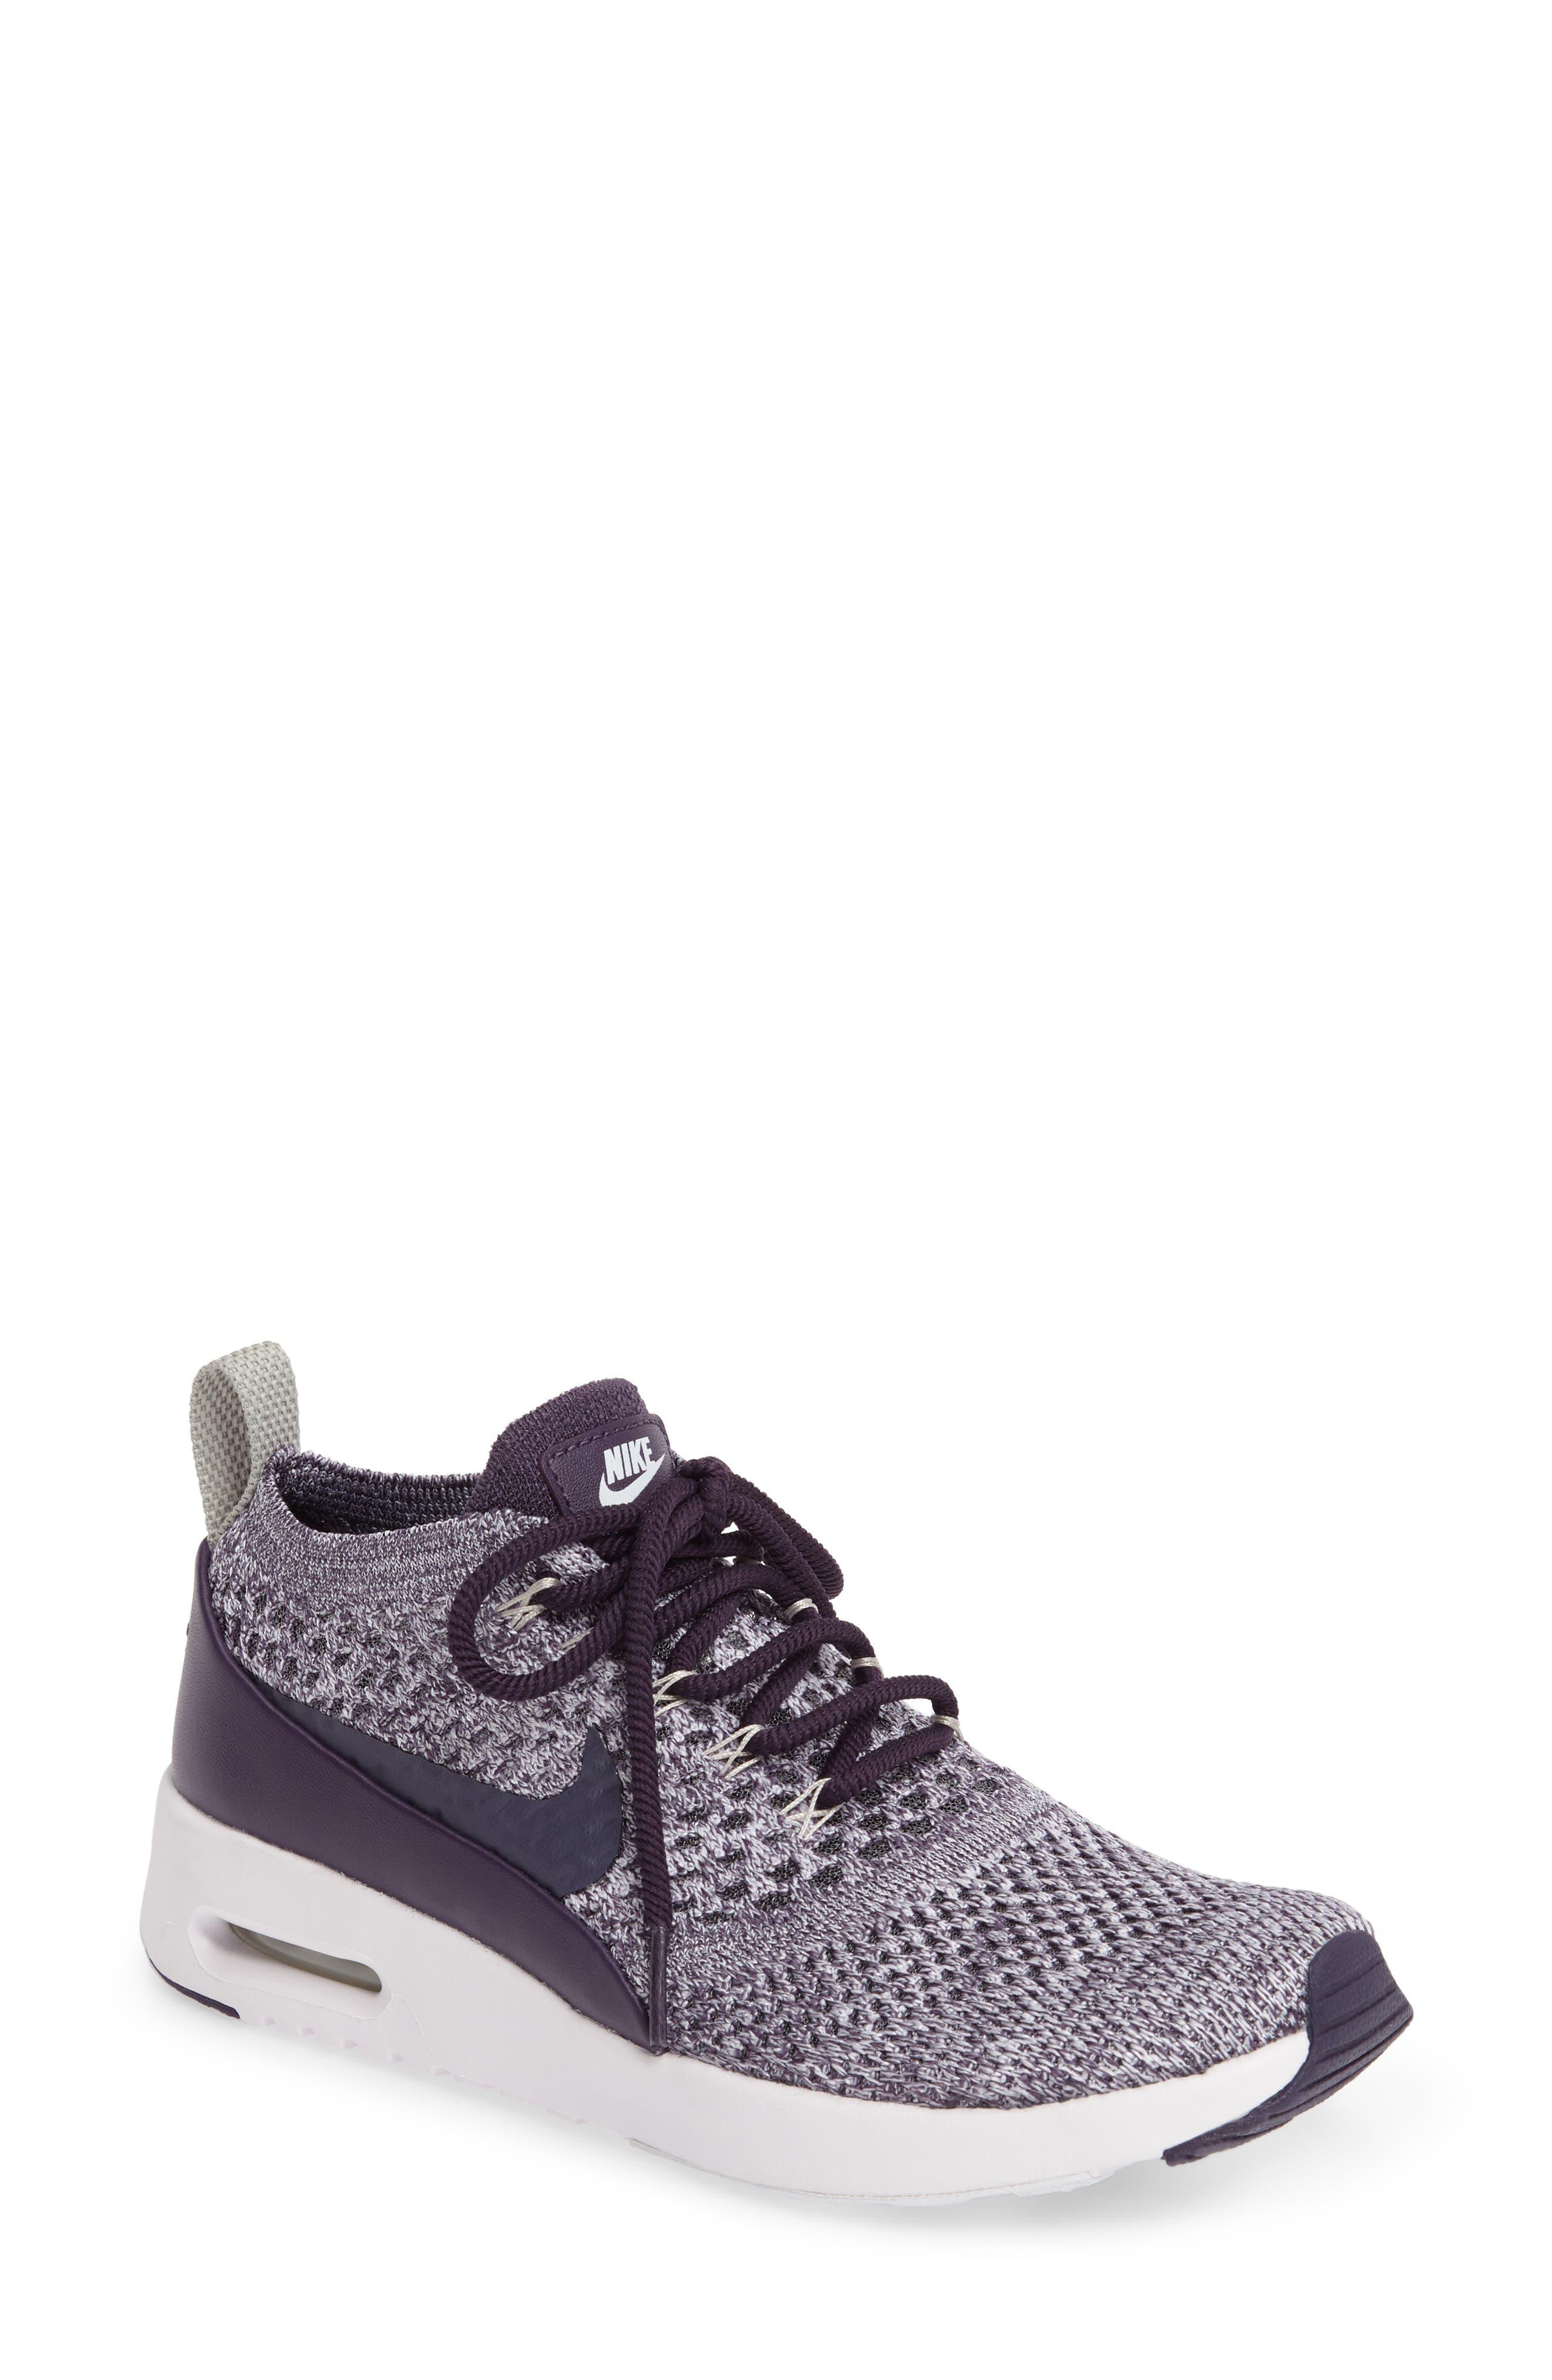 Main Image - Nike Air Max Thea Ultra Flyknit Sneaker (Women)